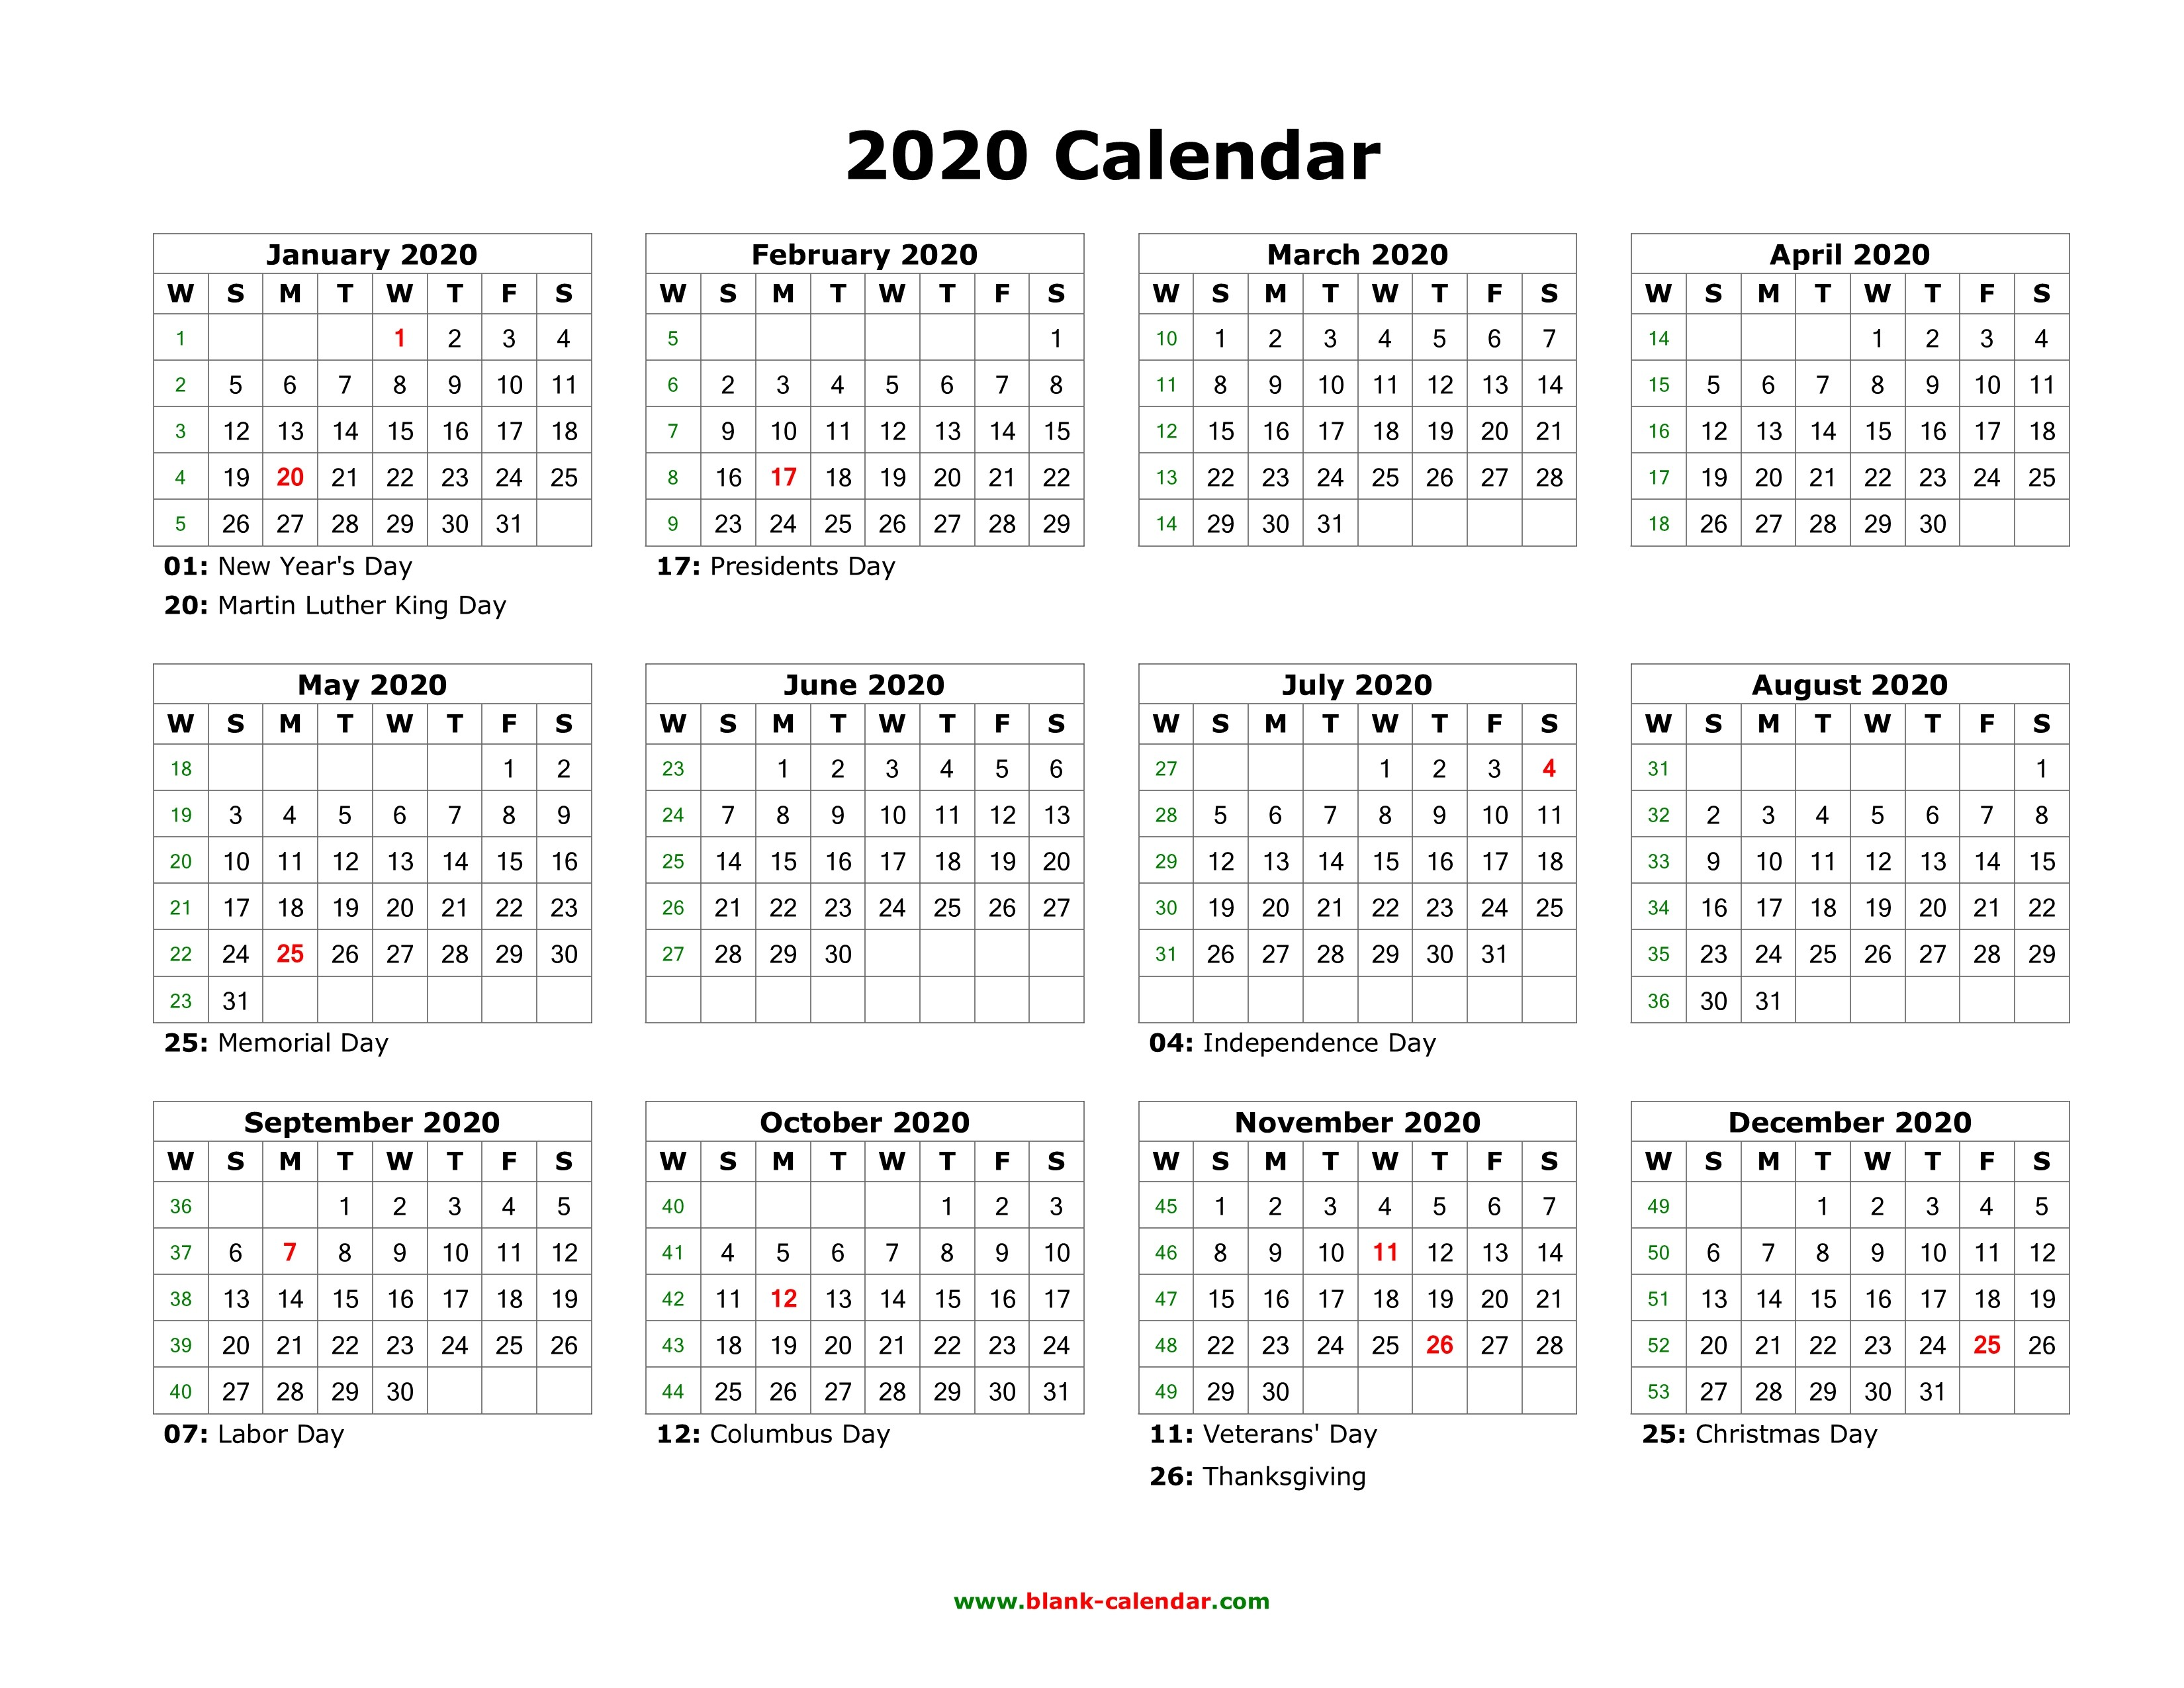 Free Printable Calendar Templates for 2020 Blank Calendar 2020